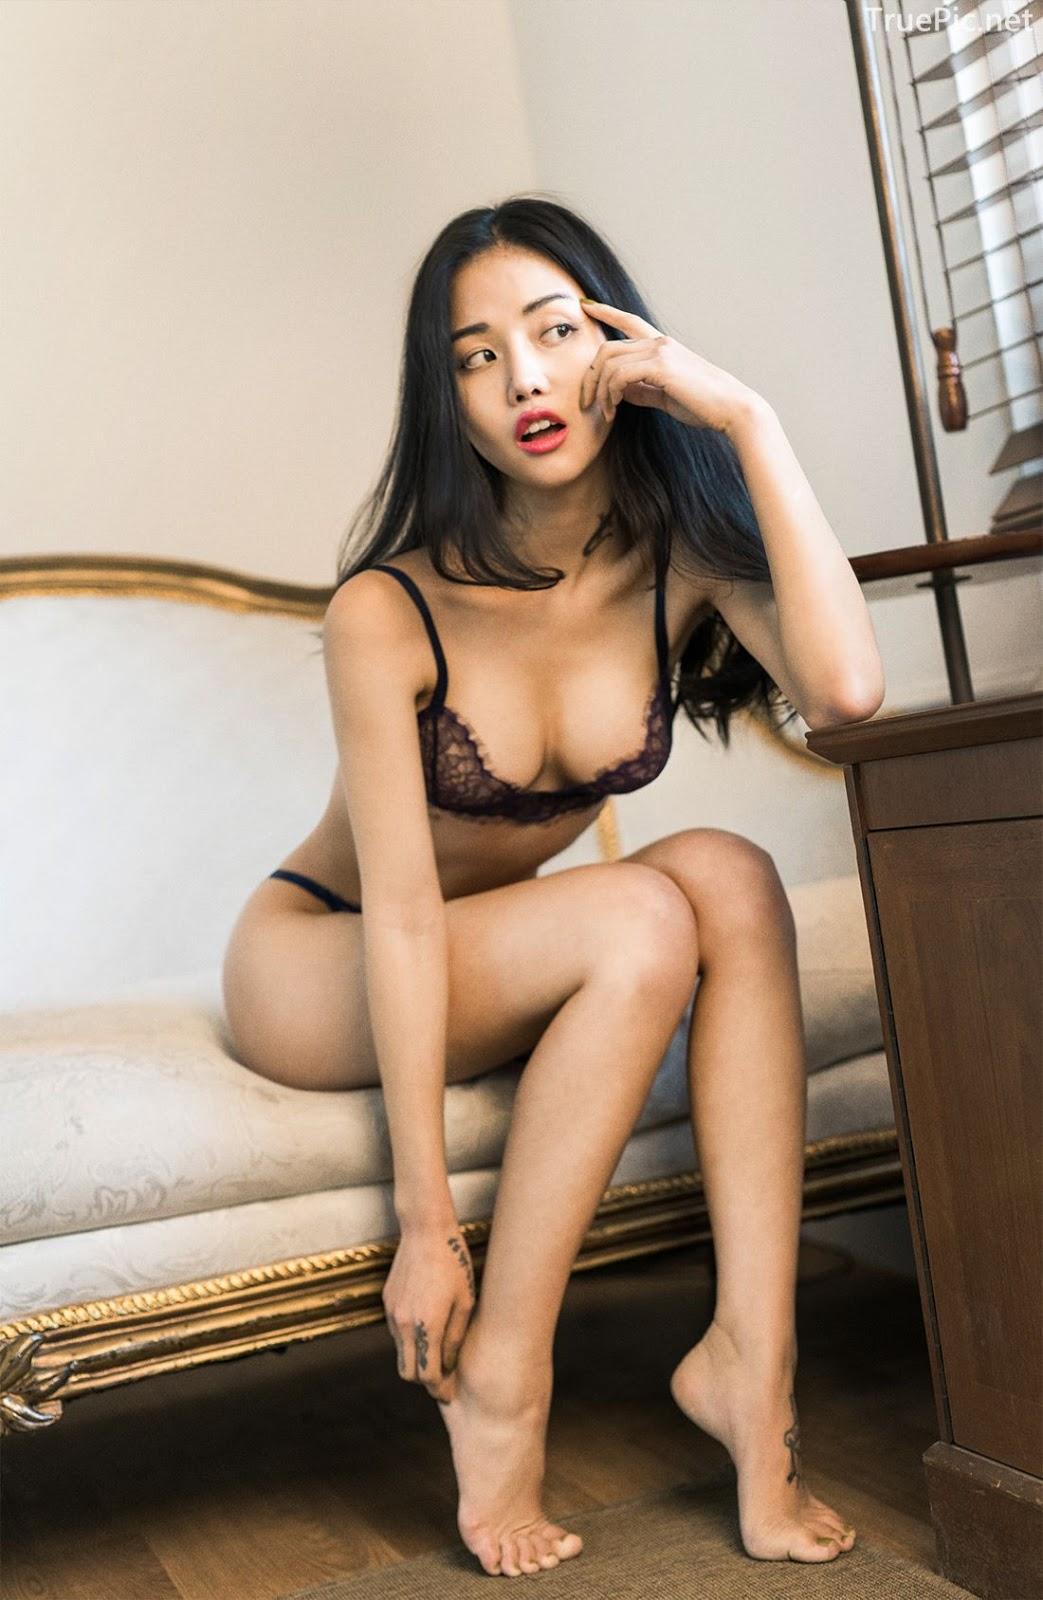 Korean Fashion Model - Baek Ye Jin - Sexy Lingerie Collection - TruePic.net - Picture 10